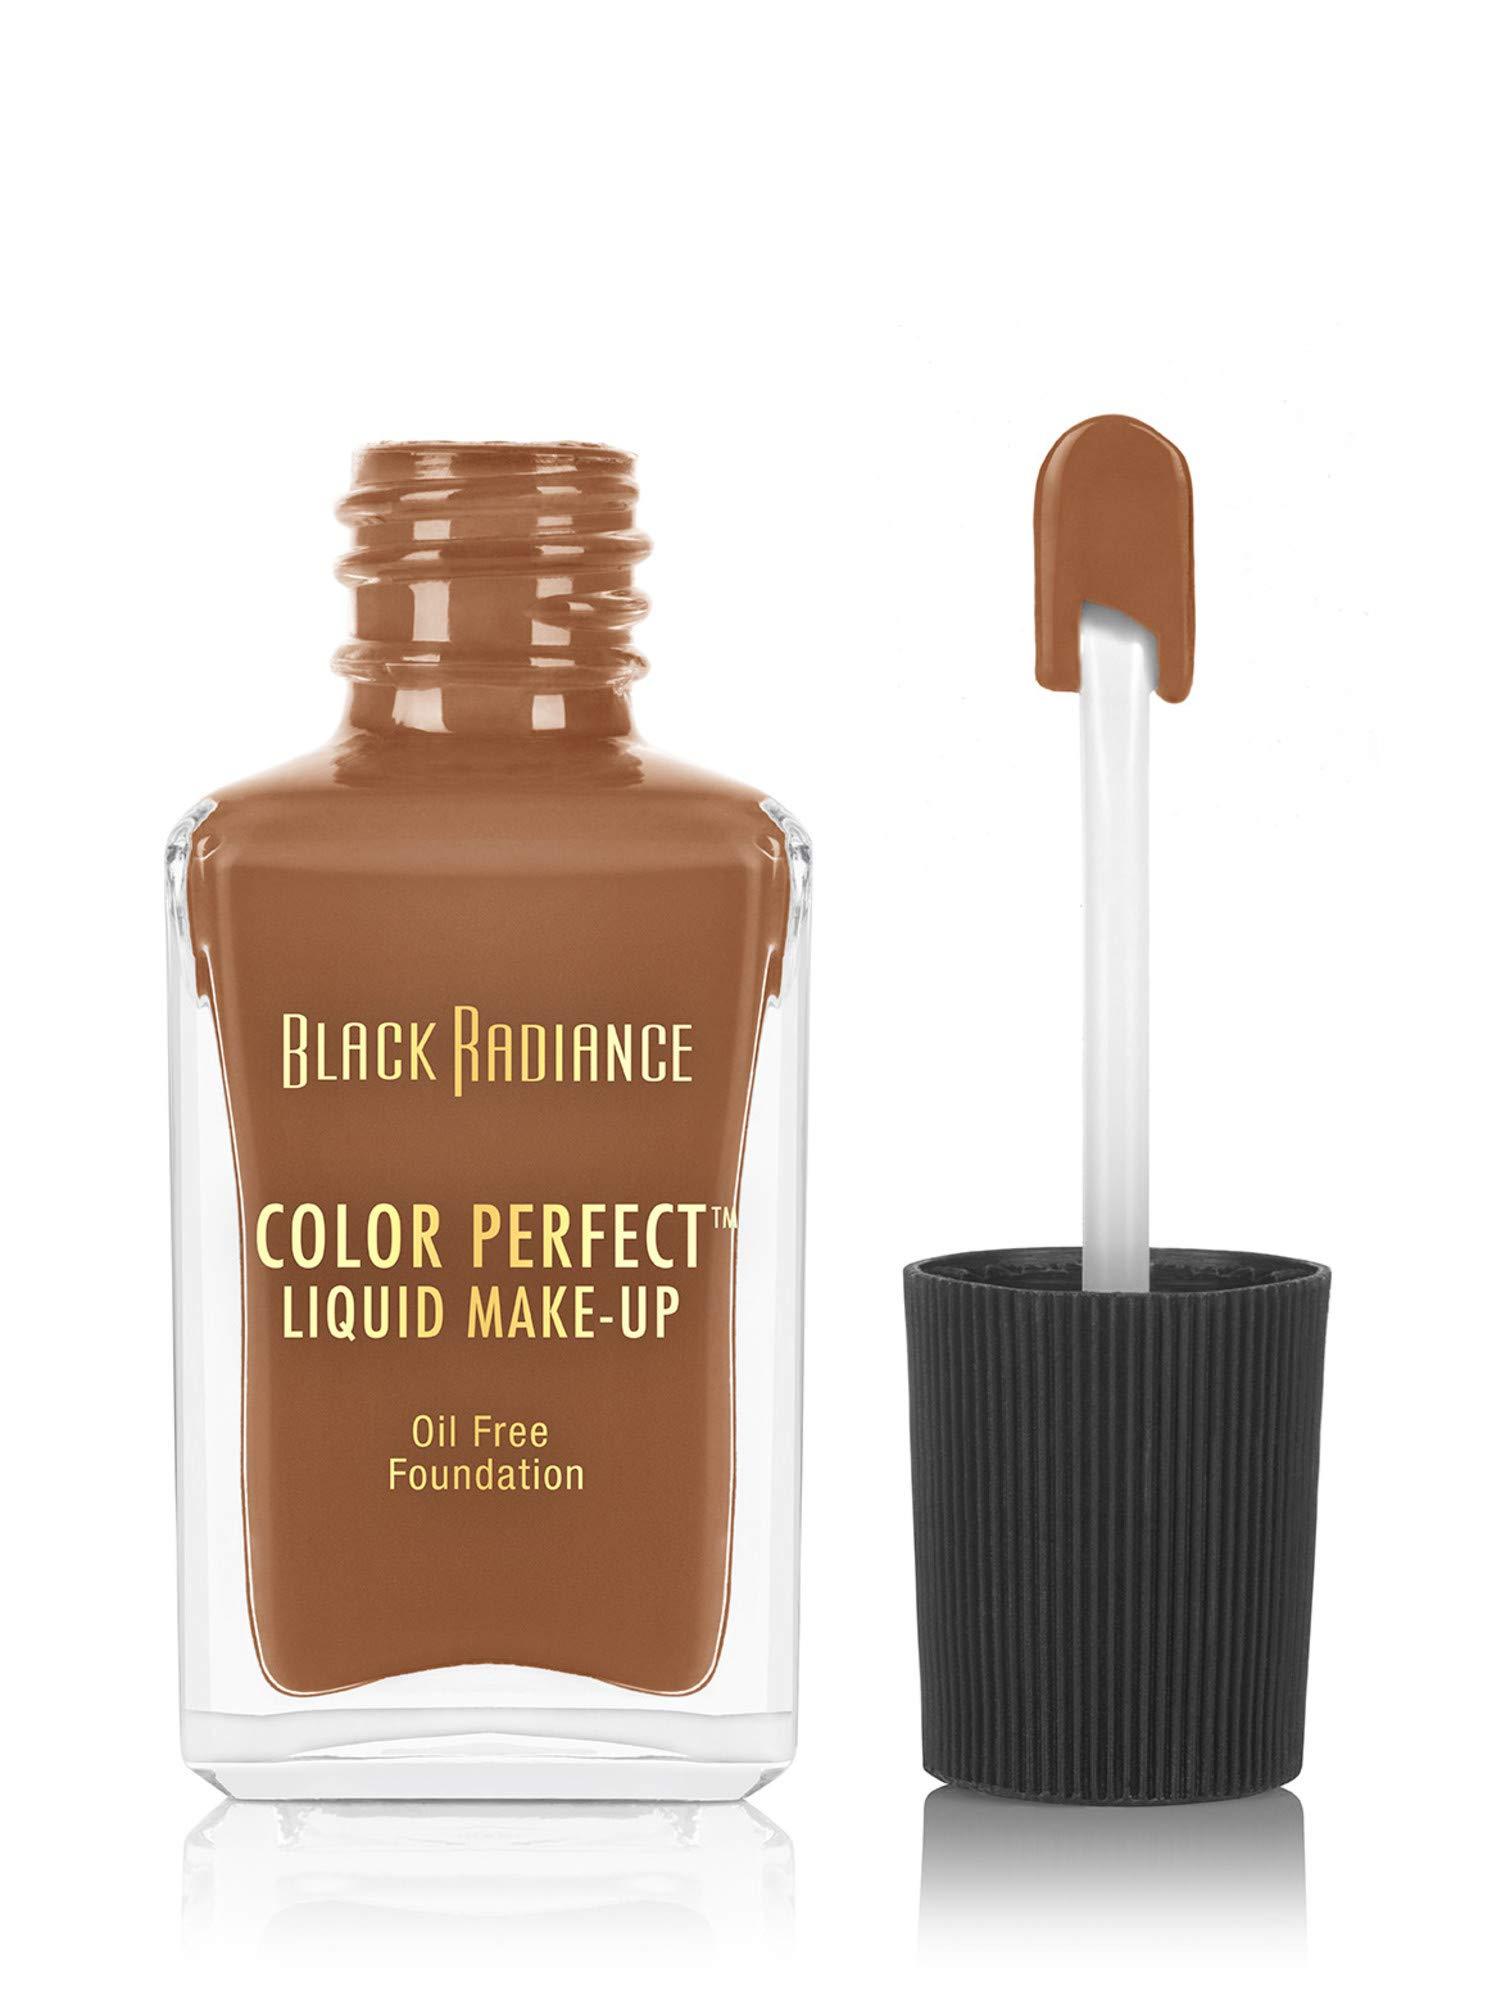 Black Radiance Color Perfect Liquid Make-Up, Caramel, 1 Fluid Ounce